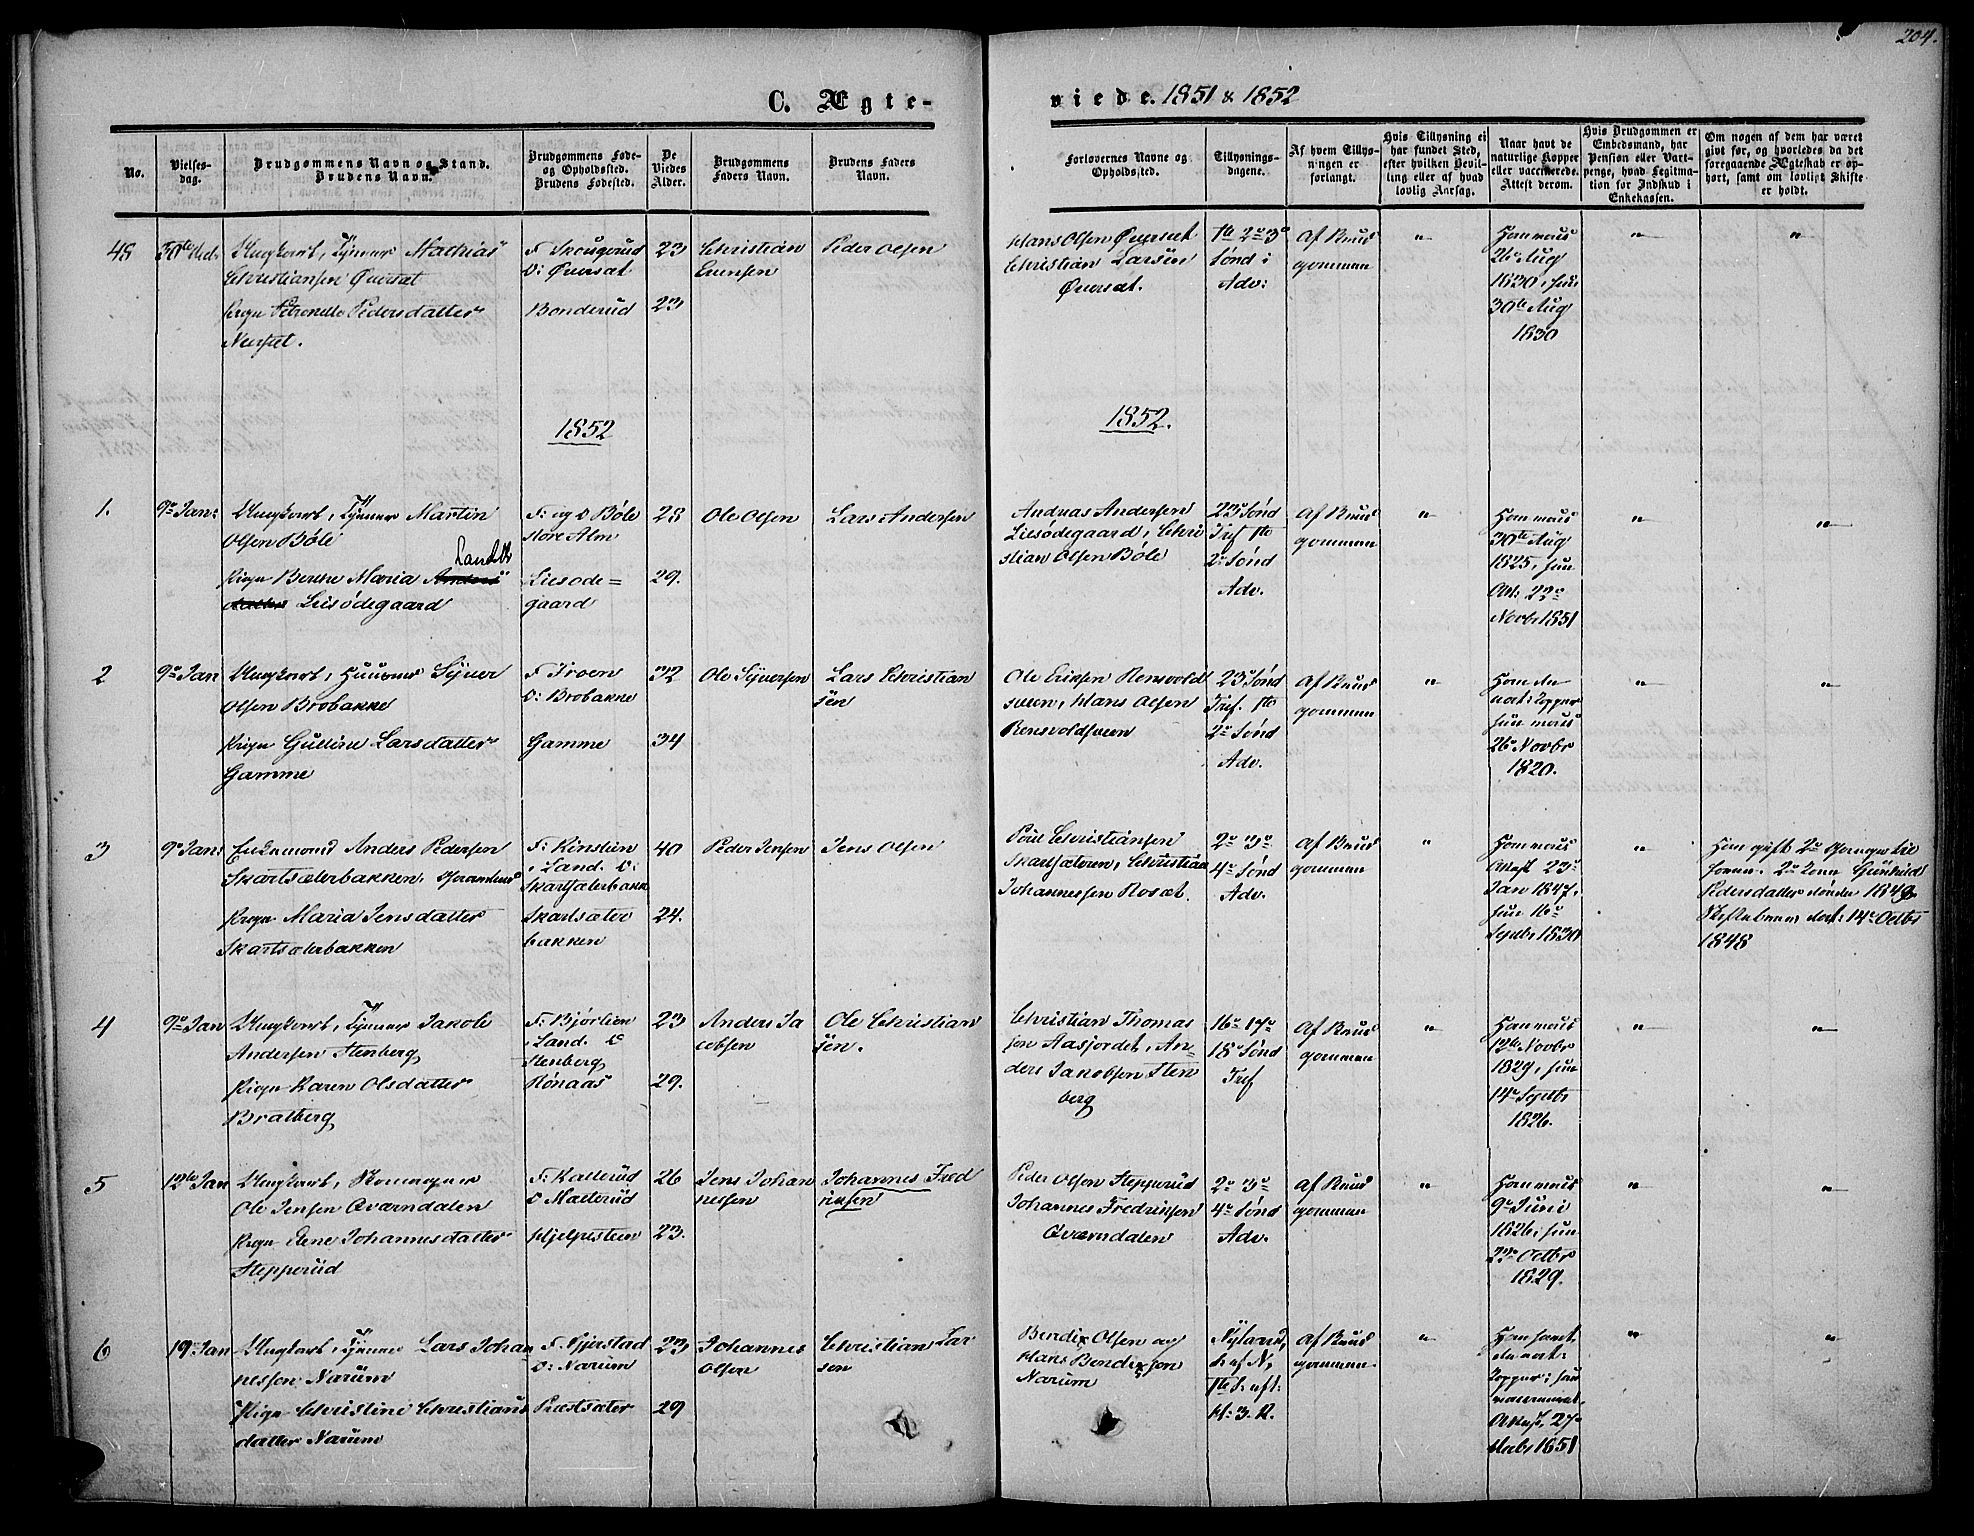 SAH, Vestre Toten prestekontor, H/Ha/Haa/L0005: Ministerialbok nr. 5, 1850-1855, s. 204